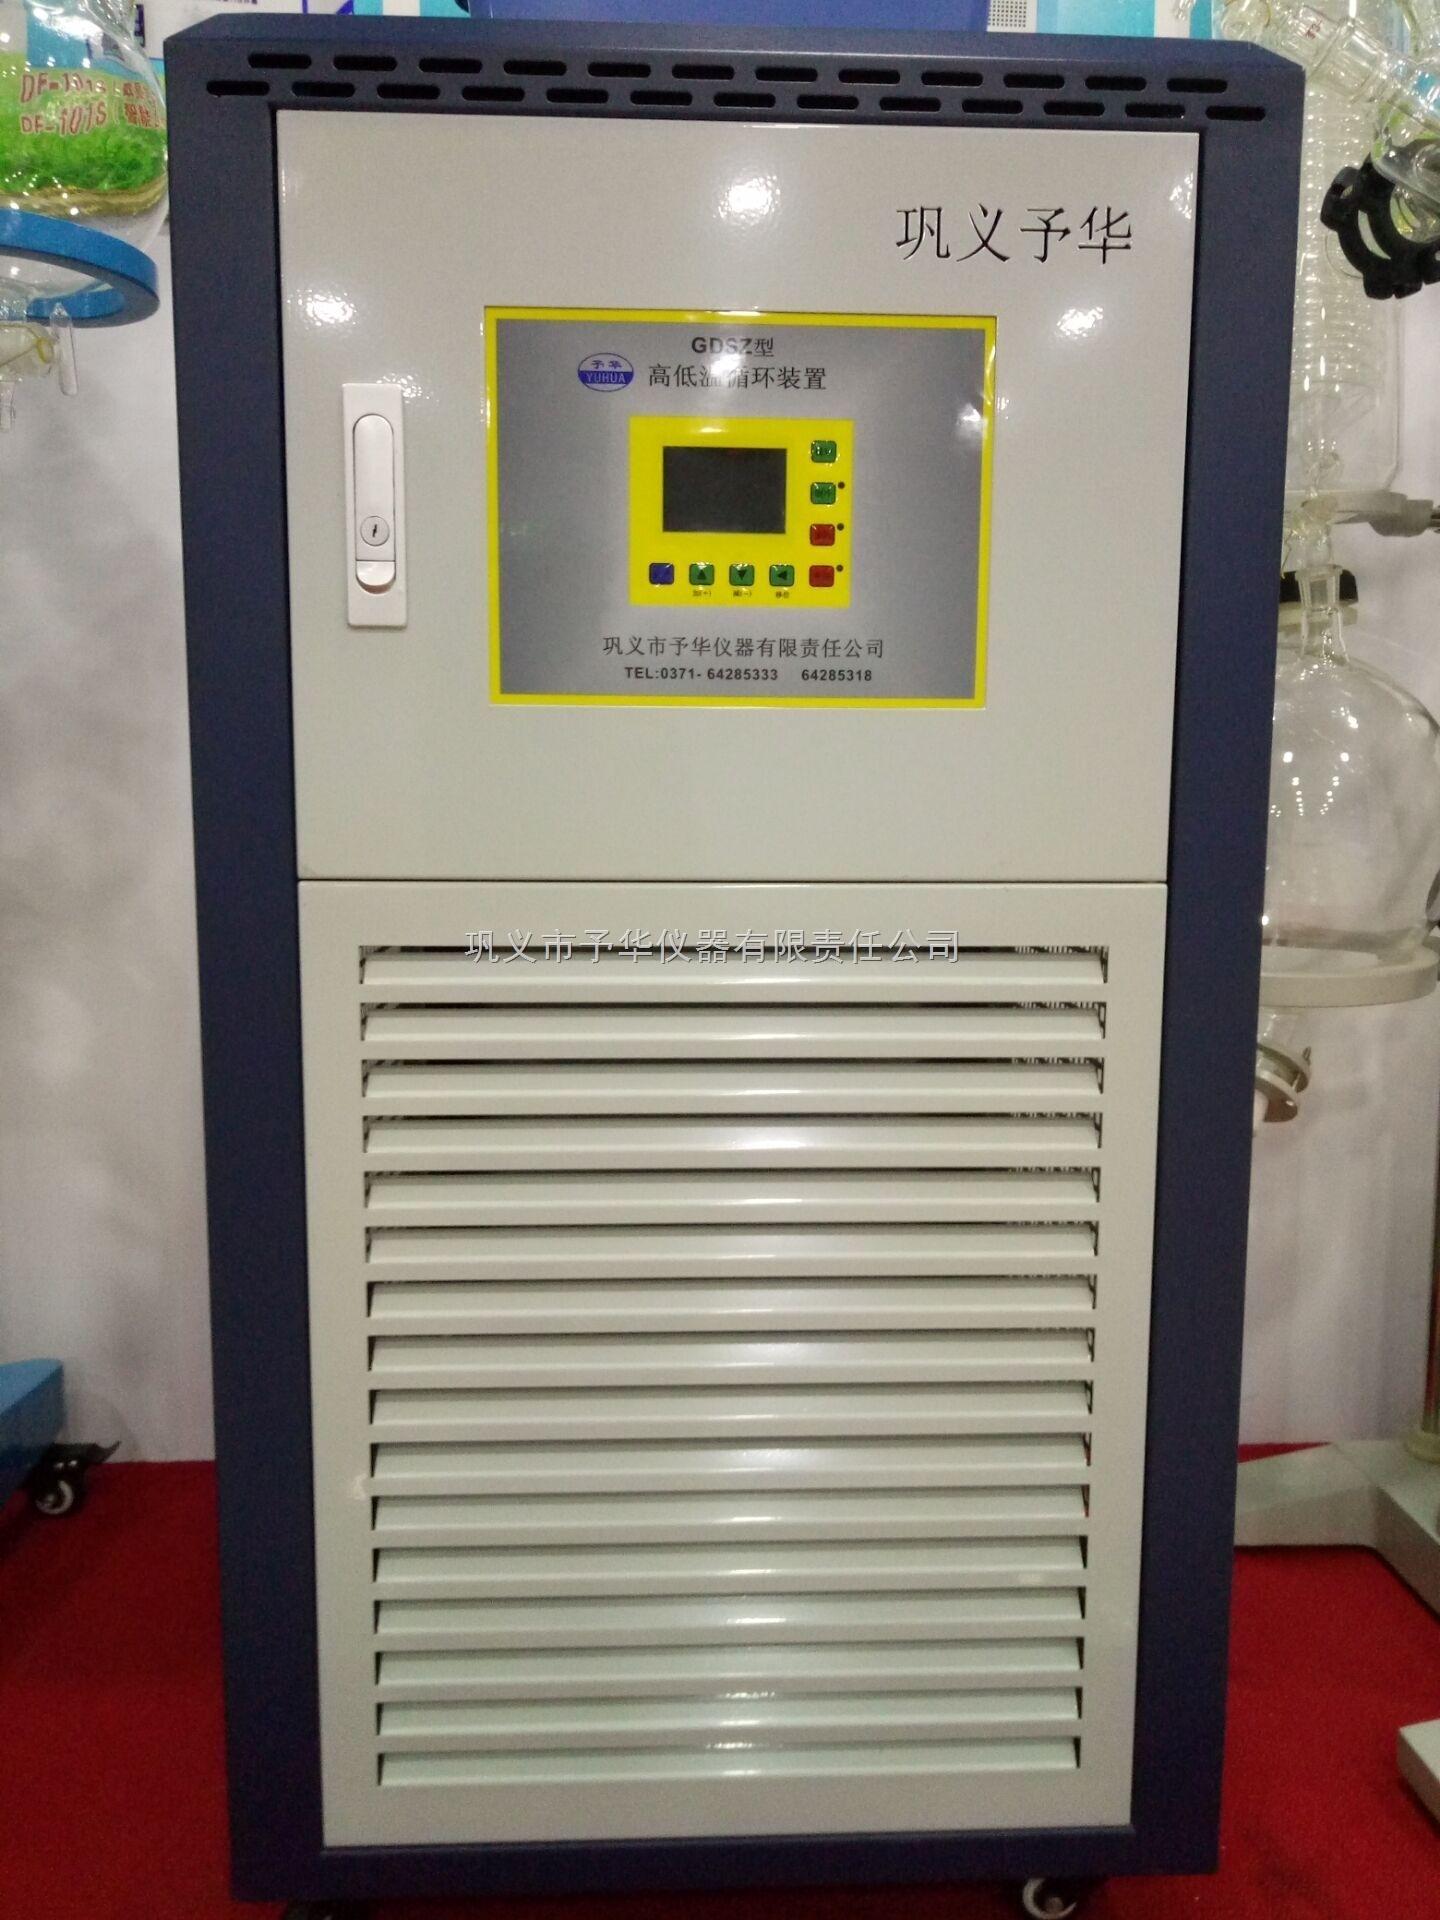 GDSZ-20/-20/+200-高低温循环一体机价格低性能好首选予华仪器